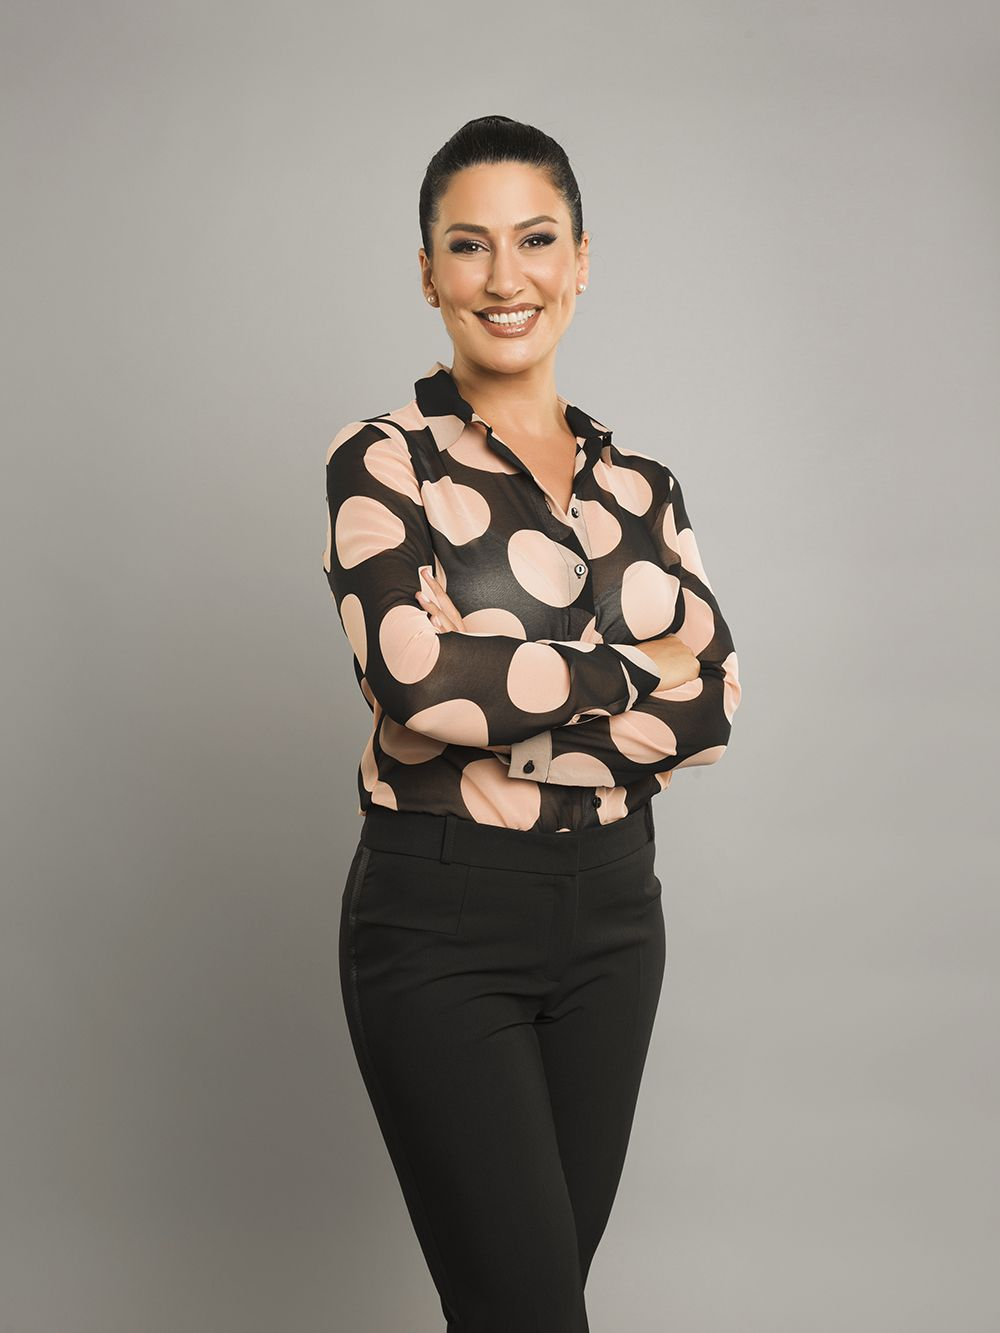 Conheça a atriz Iclal Aydin